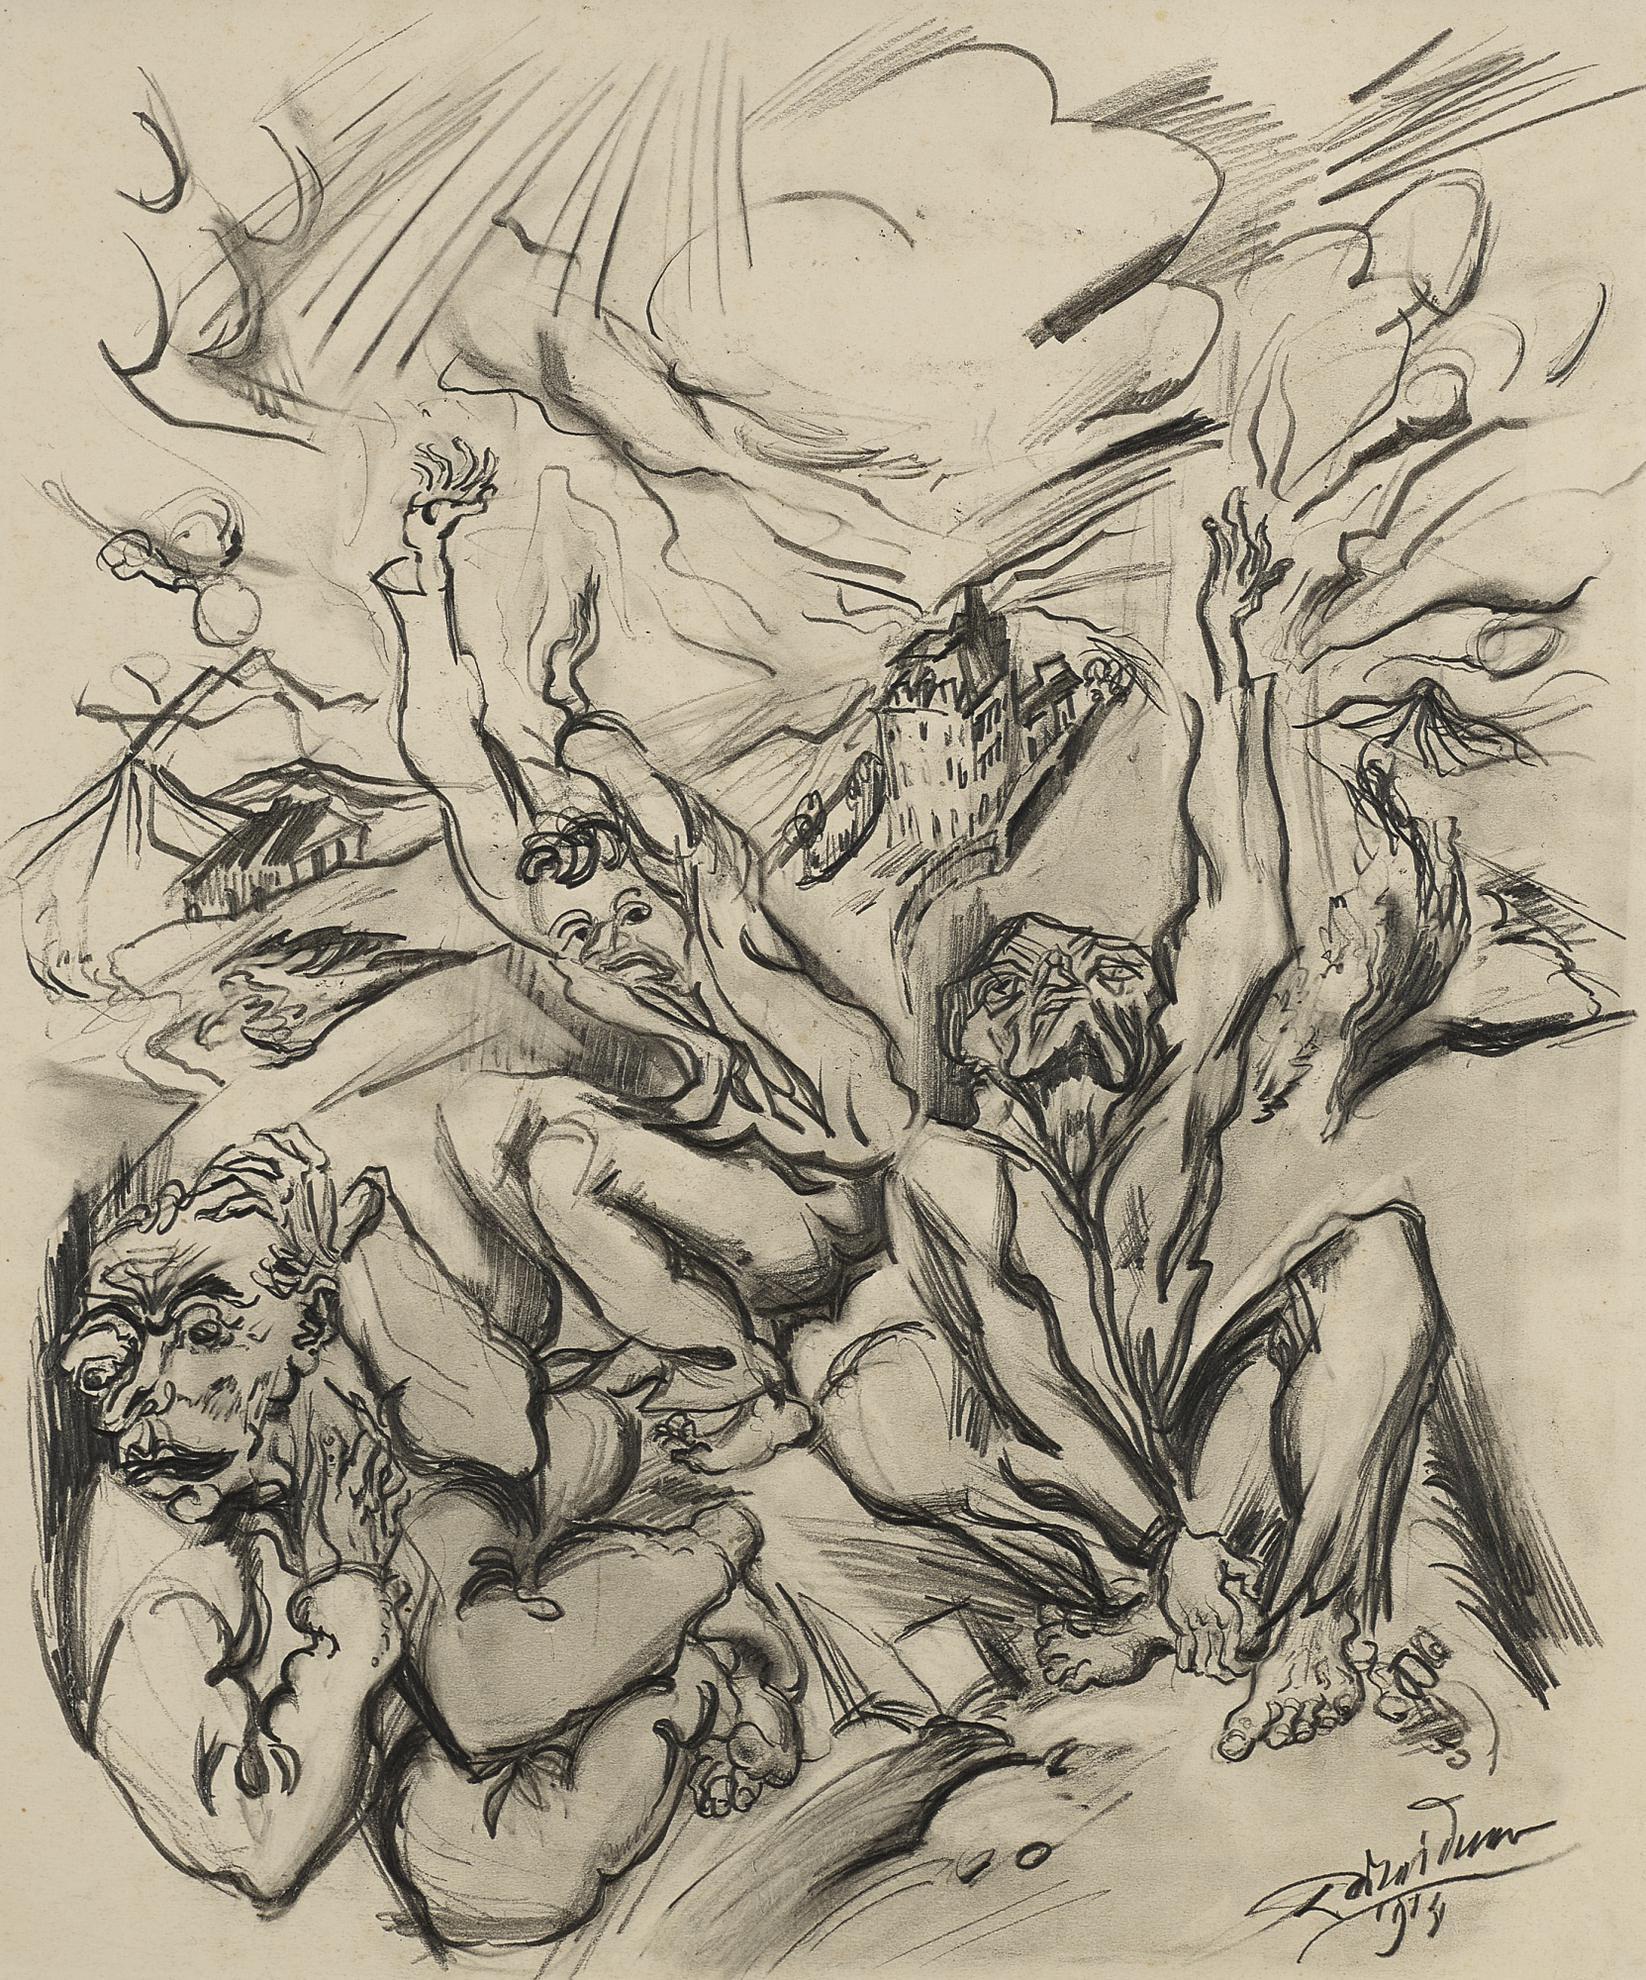 Ludwig Meidner - Angst (Fear)-1914